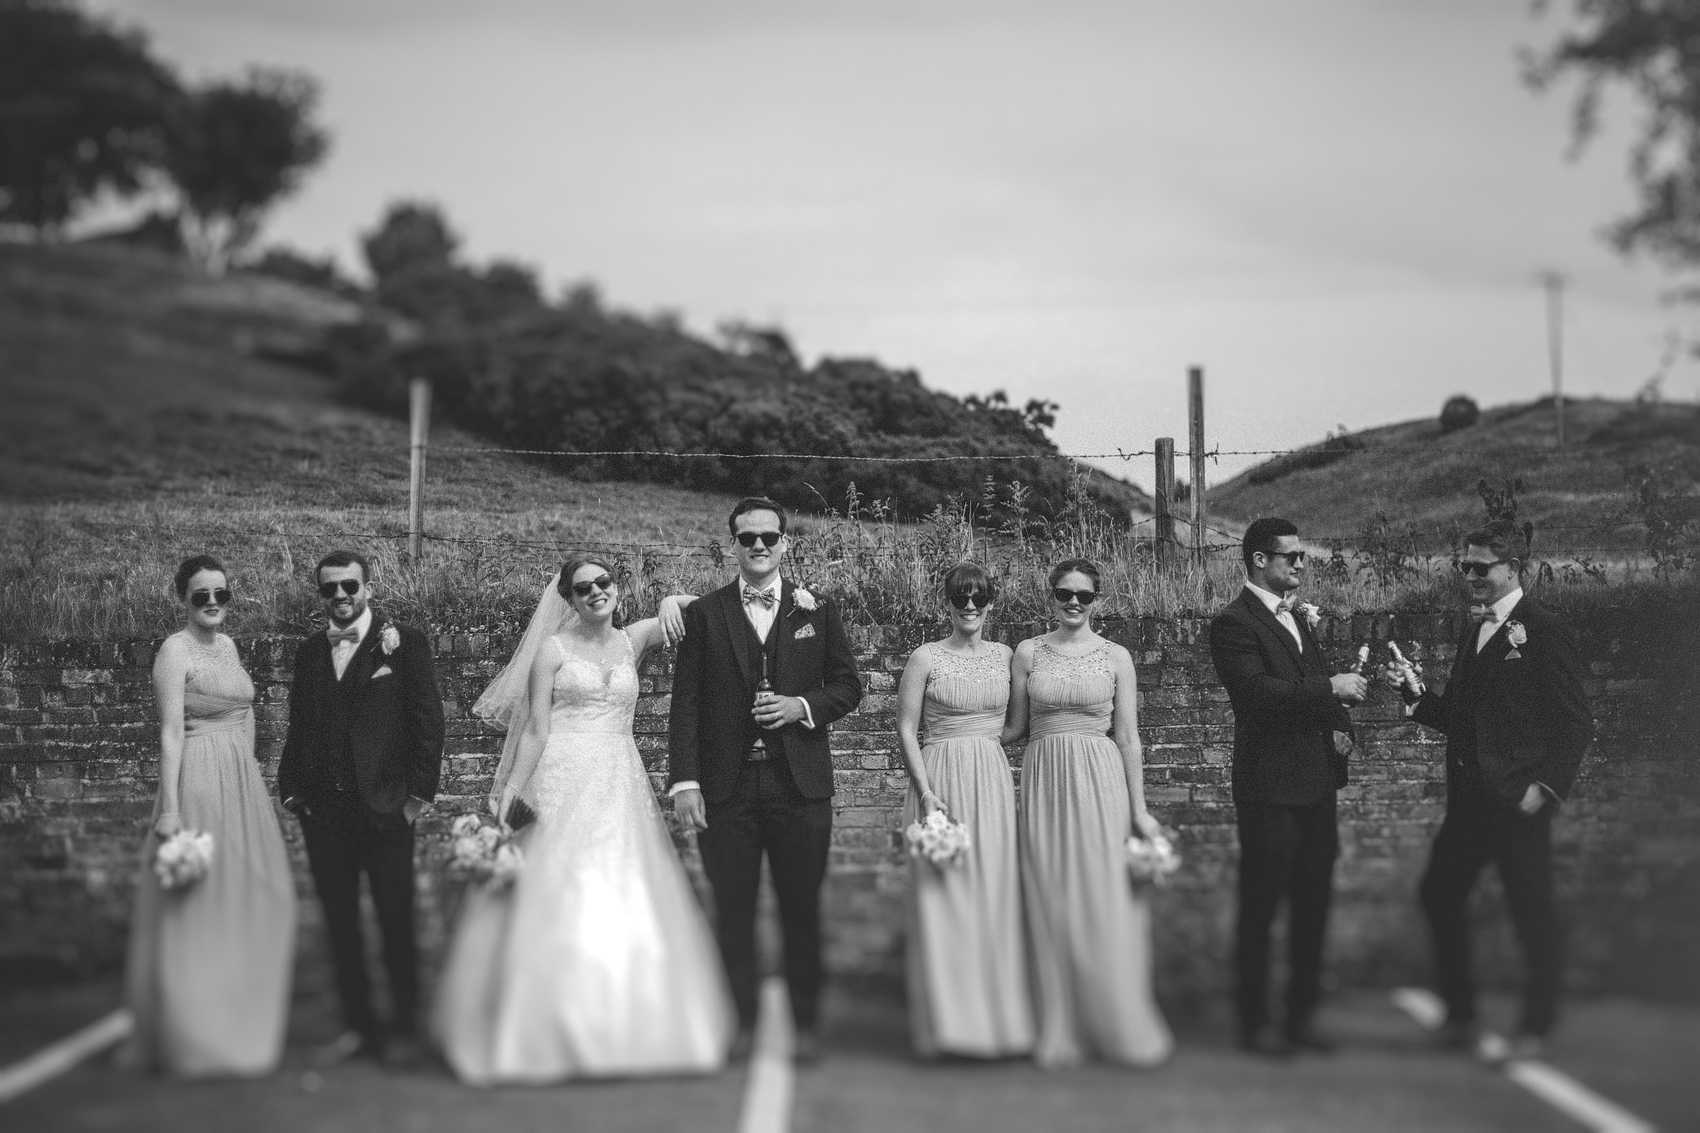 Dilhorne_Village_Hall_Wedding_Photography_-_44_.jpg